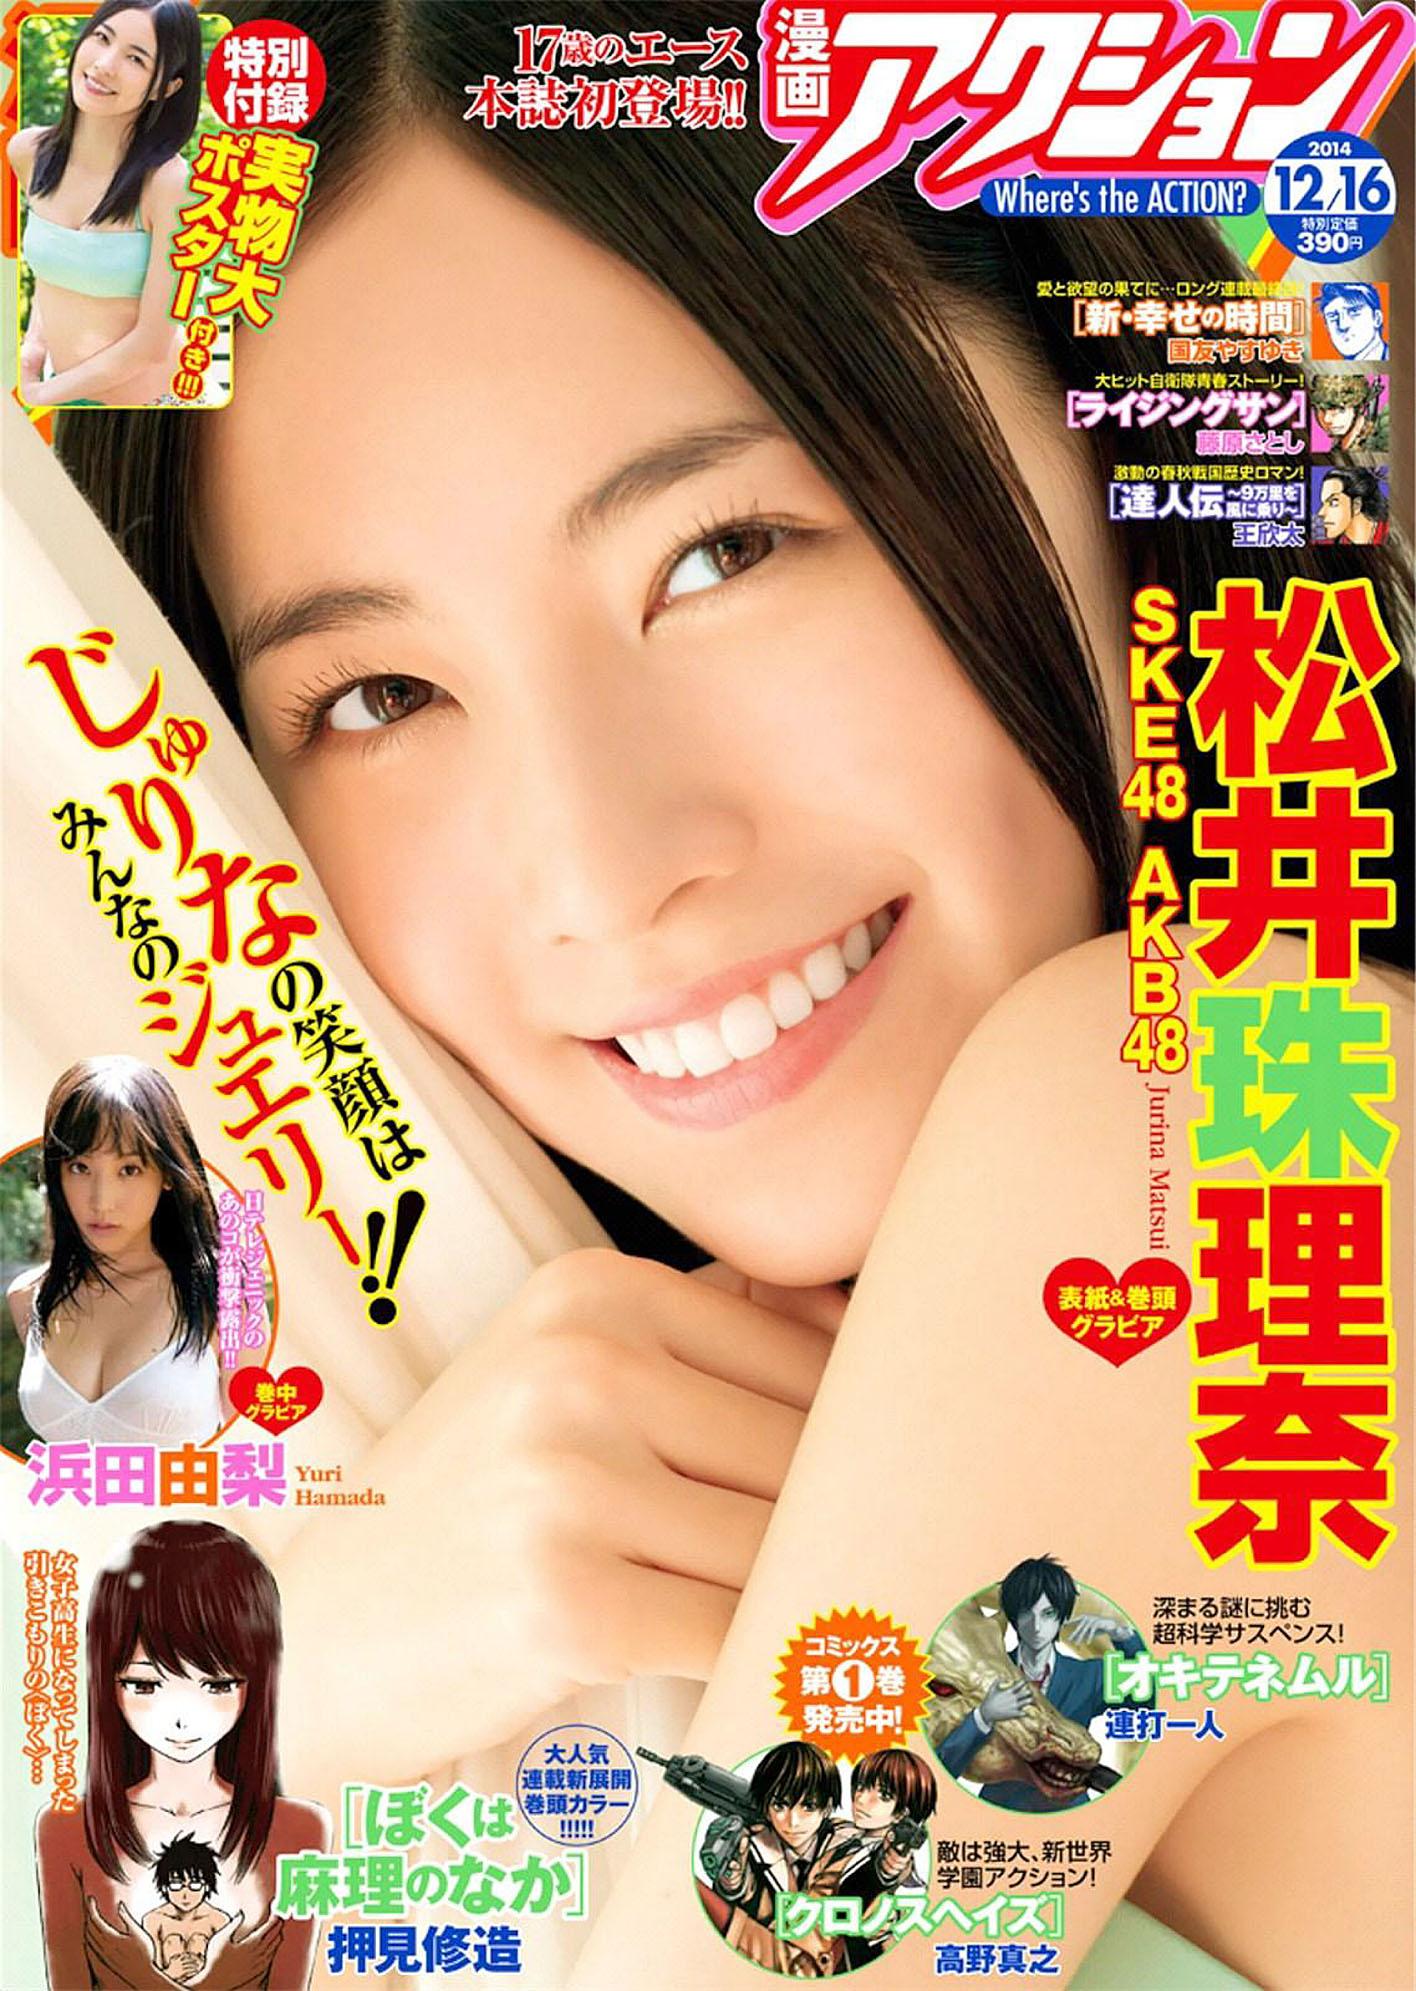 MJurina Manga Action 141216 01.jpg